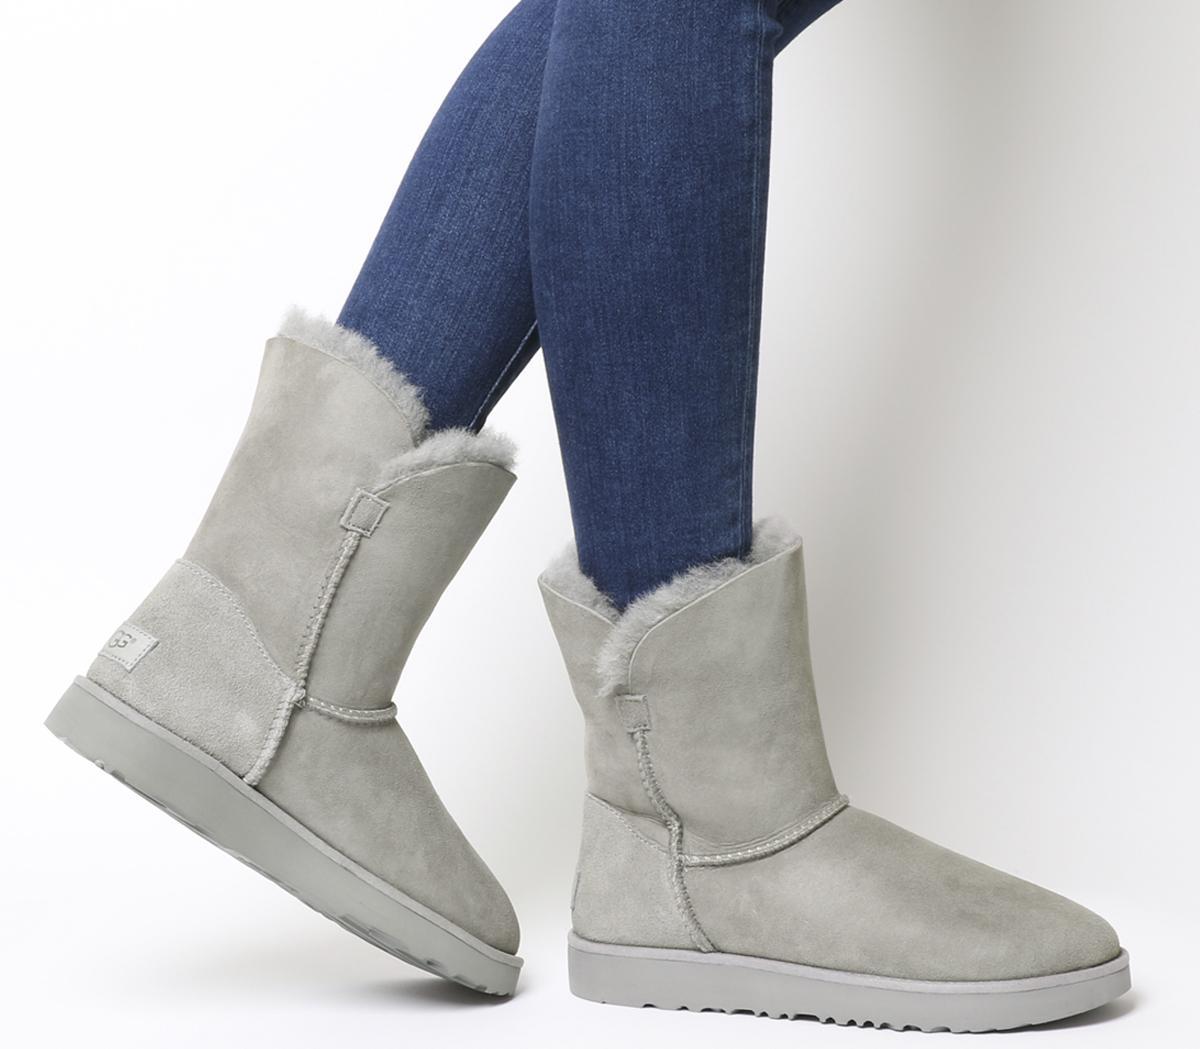 UGG Classic Cuff Short Boots Seal